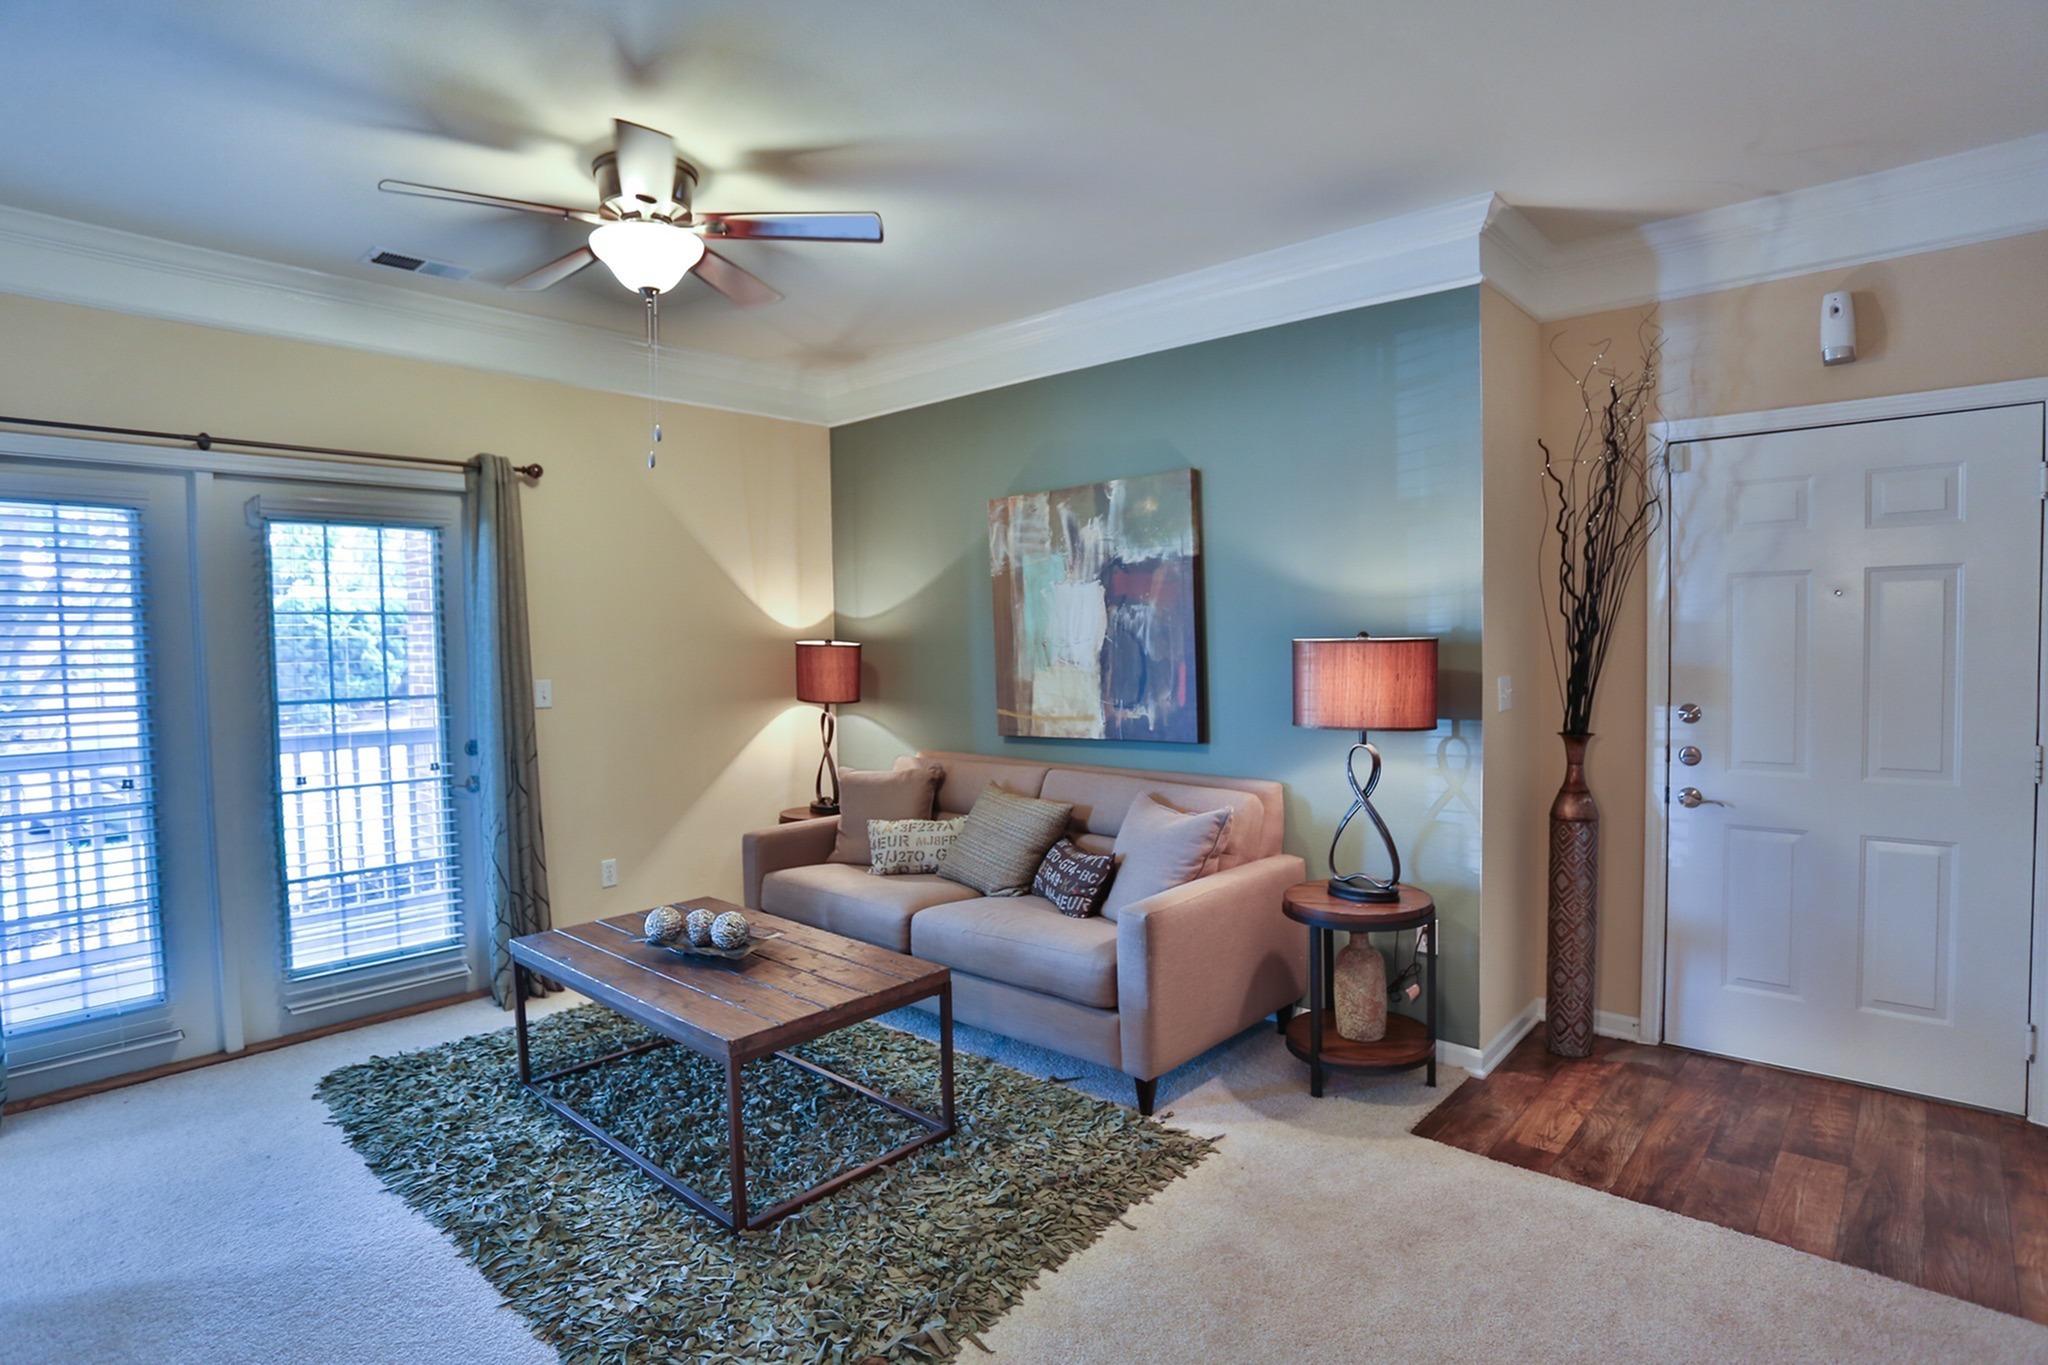 Summit Ridge Apartments - uCribs